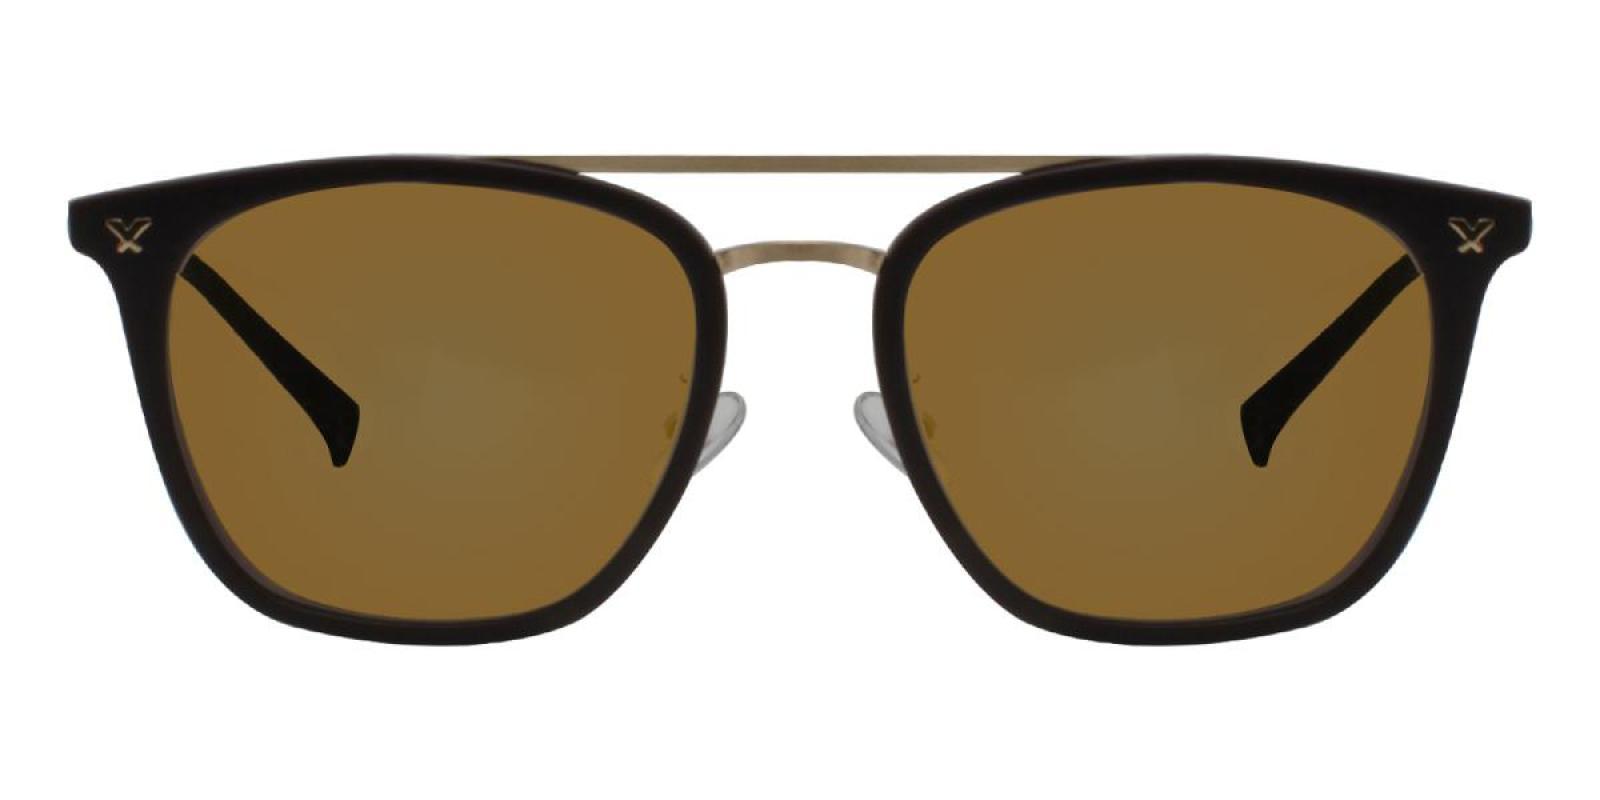 Seagual-Brown-Aviator-Metal / Combination / TR-Sunglasses-additional2